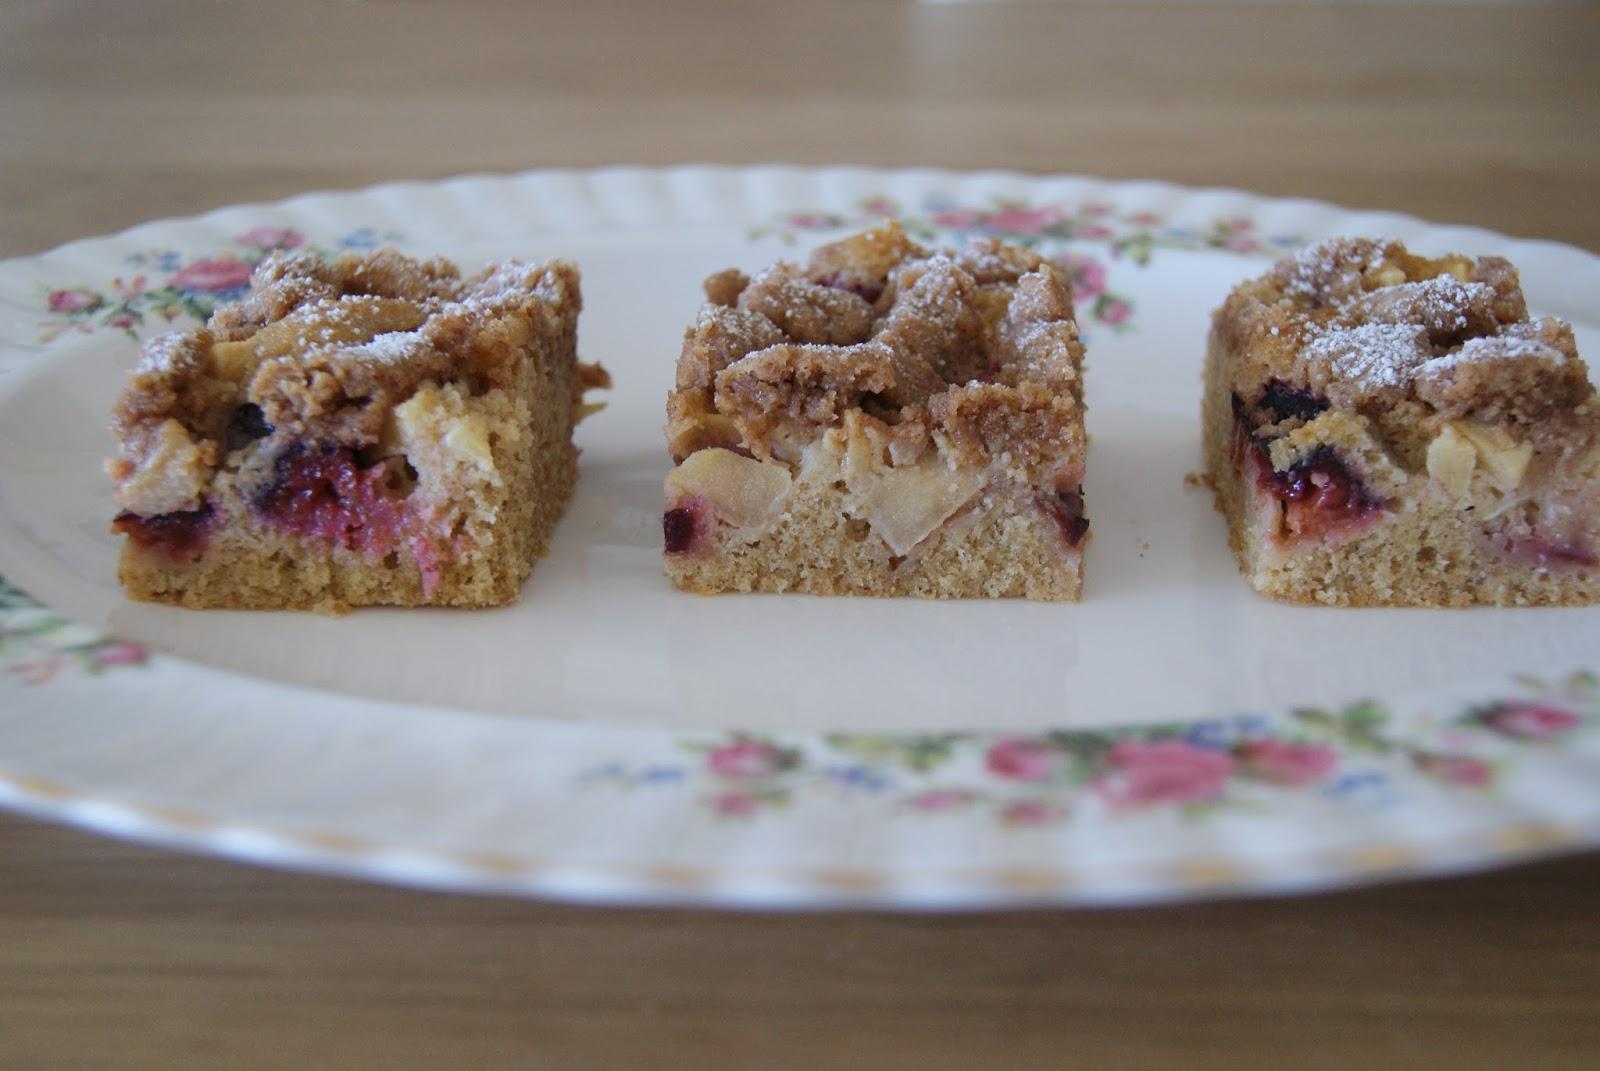 Biscuit And Buttercream Apfel Zwetschgenkuchen Mit Zimtstreuseln